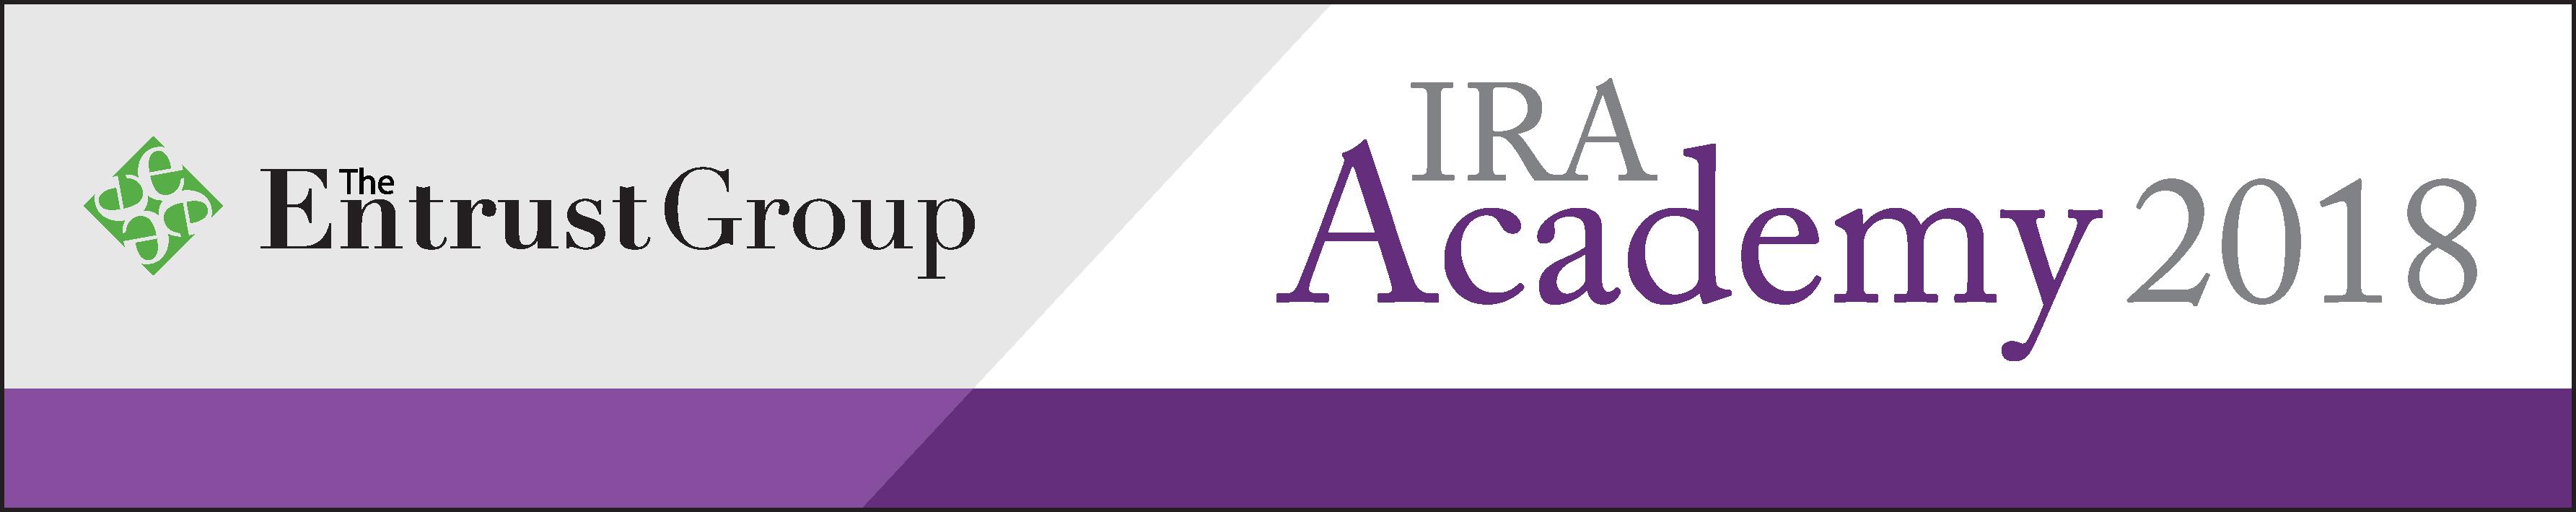 IRA_academy-2018-1285x255.png